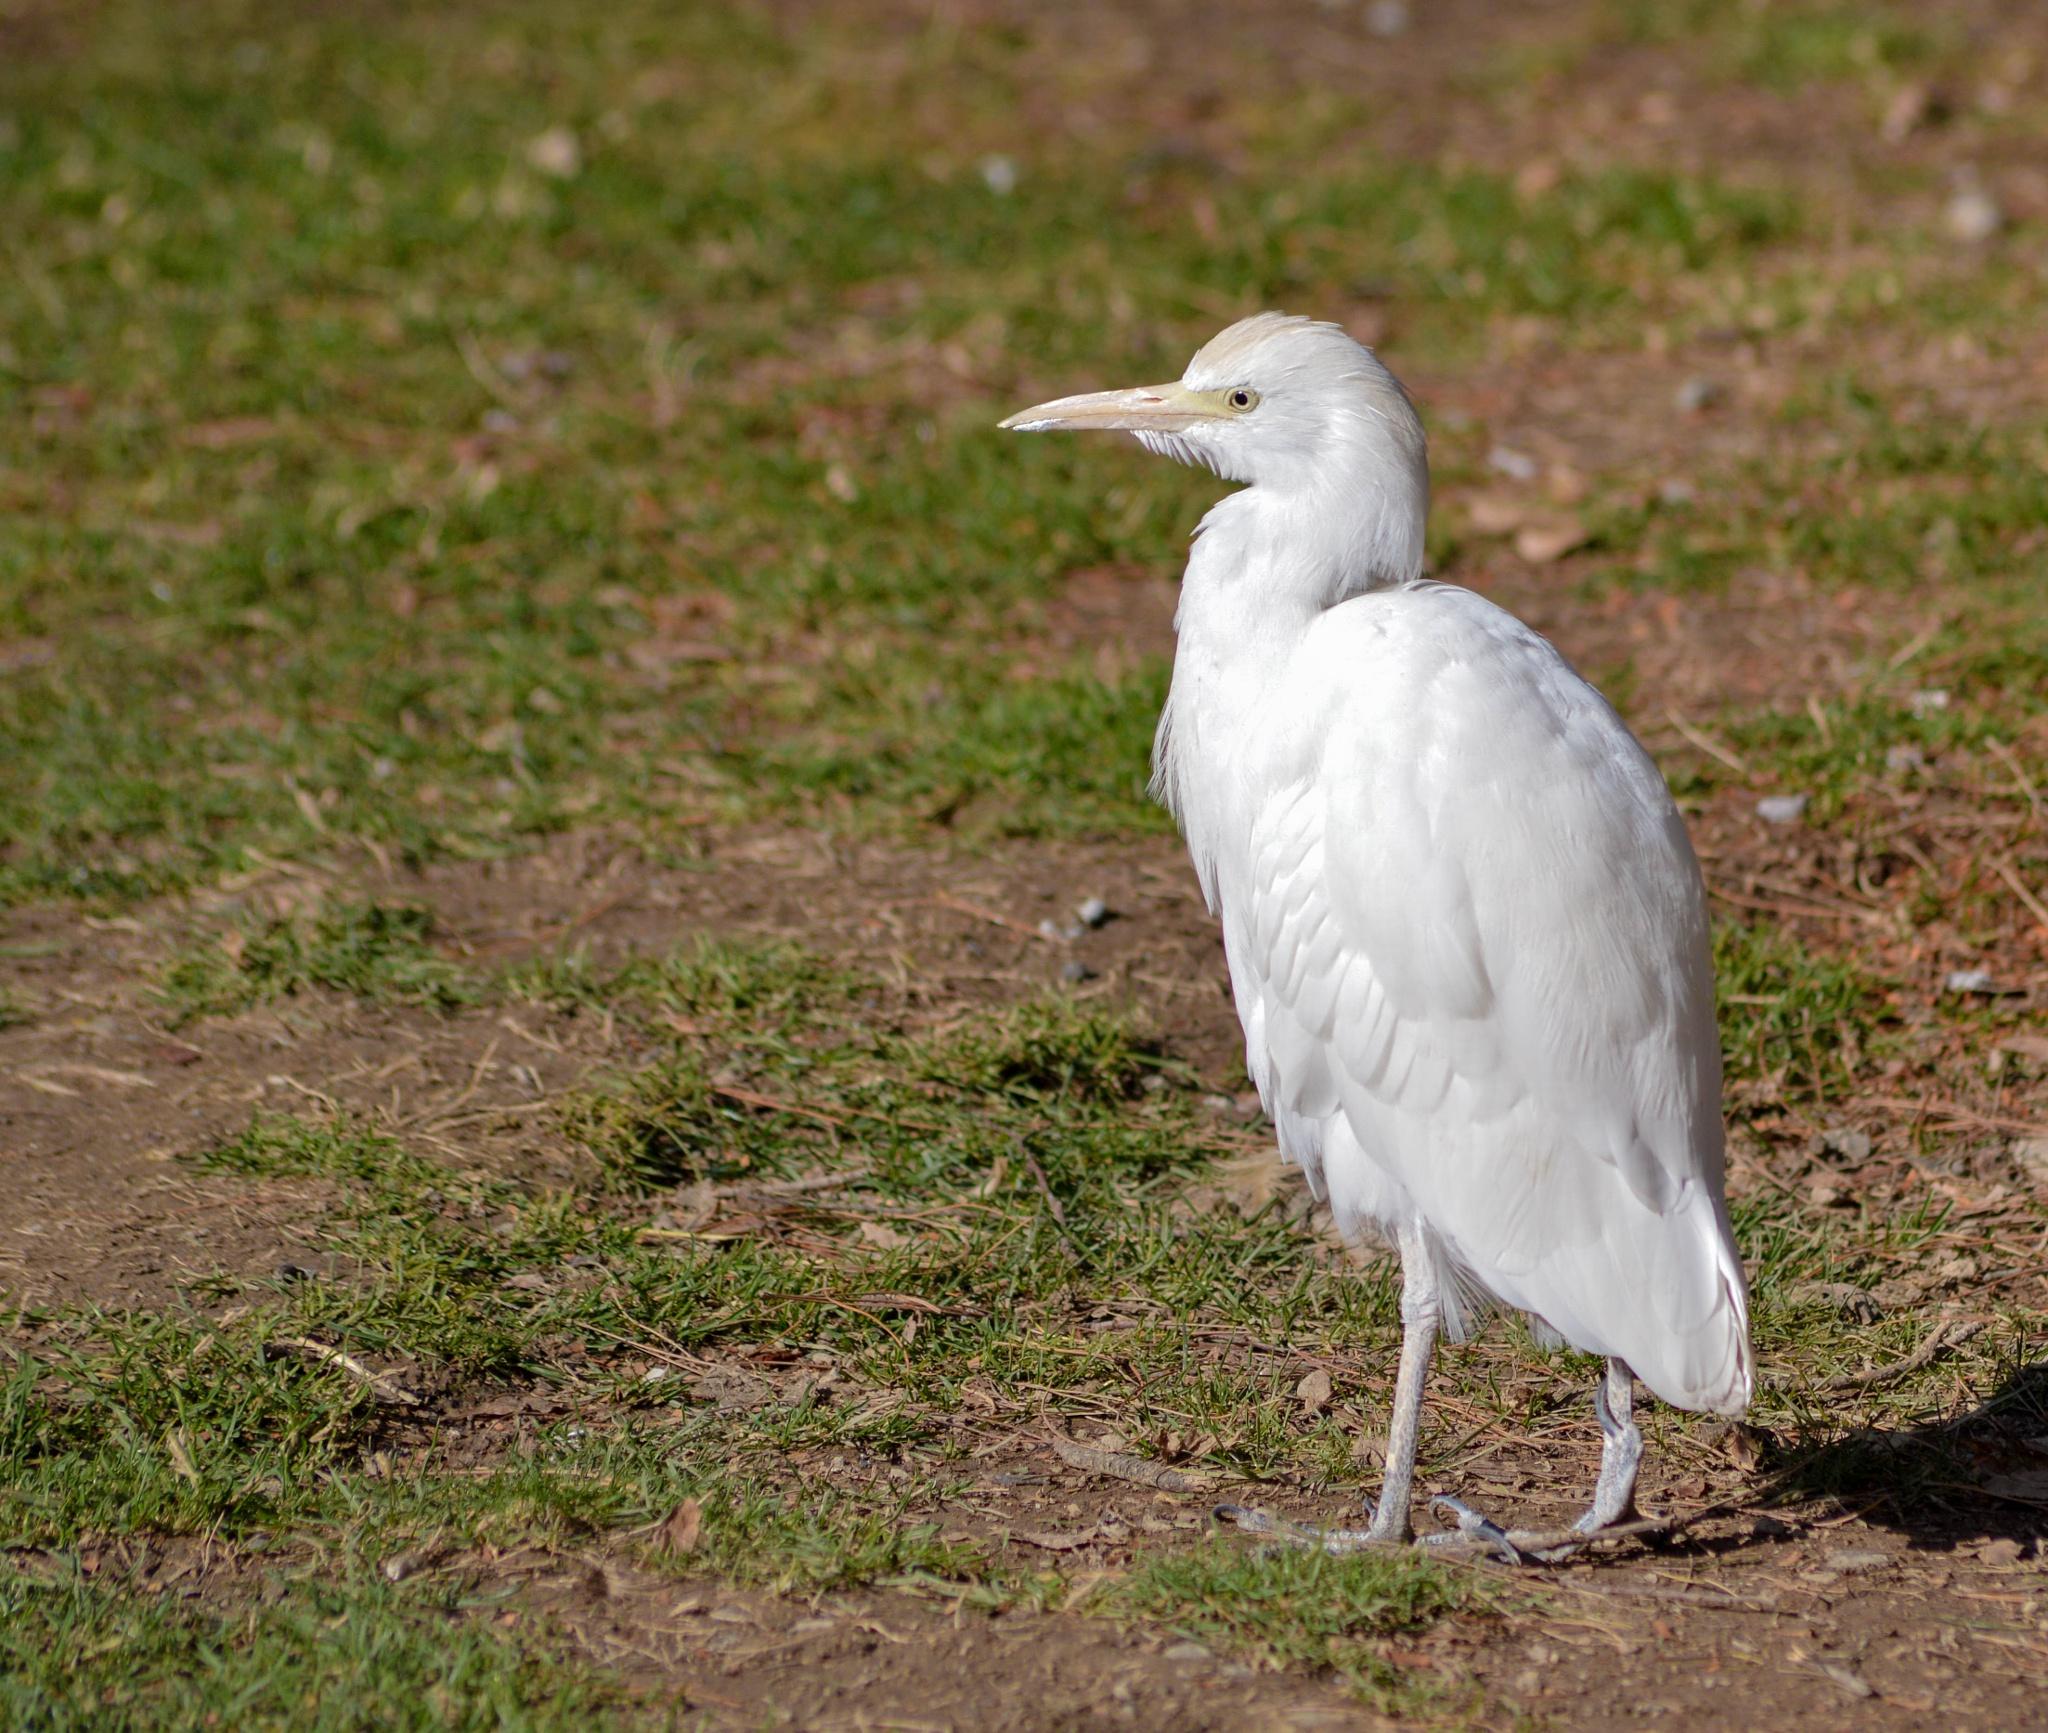 The White Bird by Kaiser76